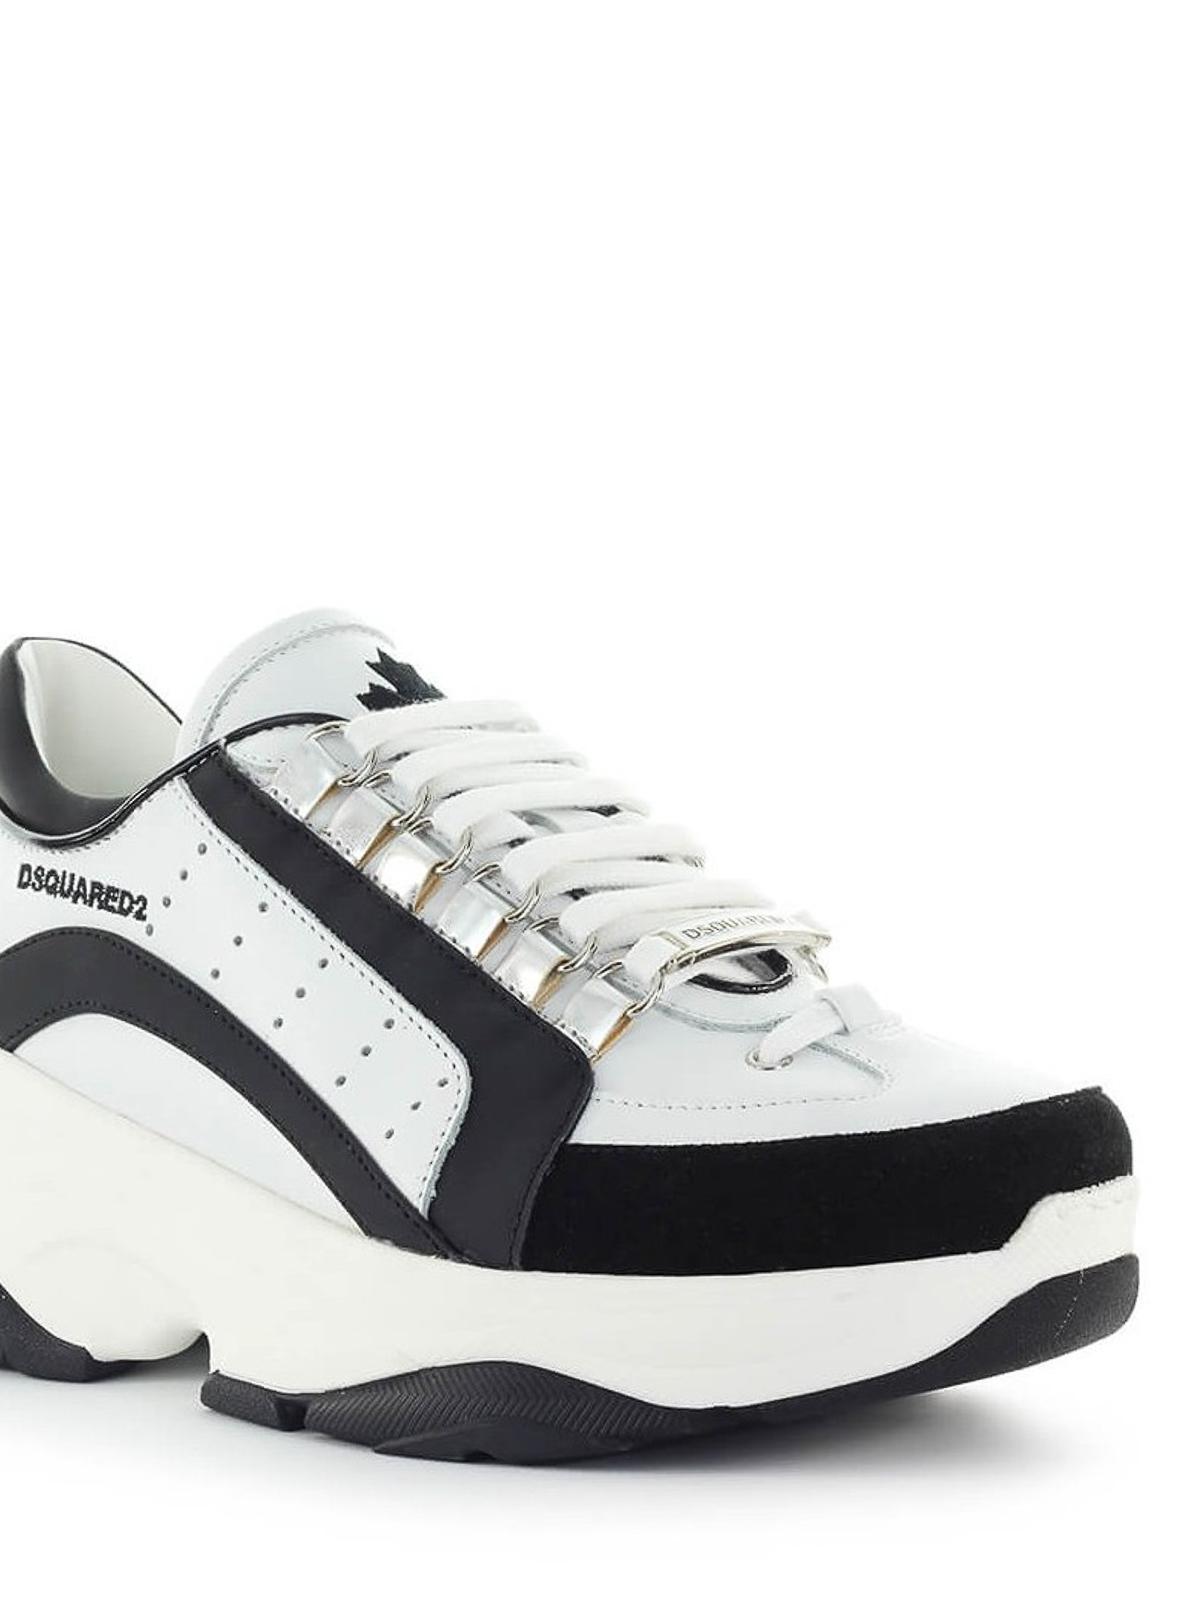 b3f4ca25f Dsquared2 - Baskets - Bumpy 551 - Chaussures de sport ...